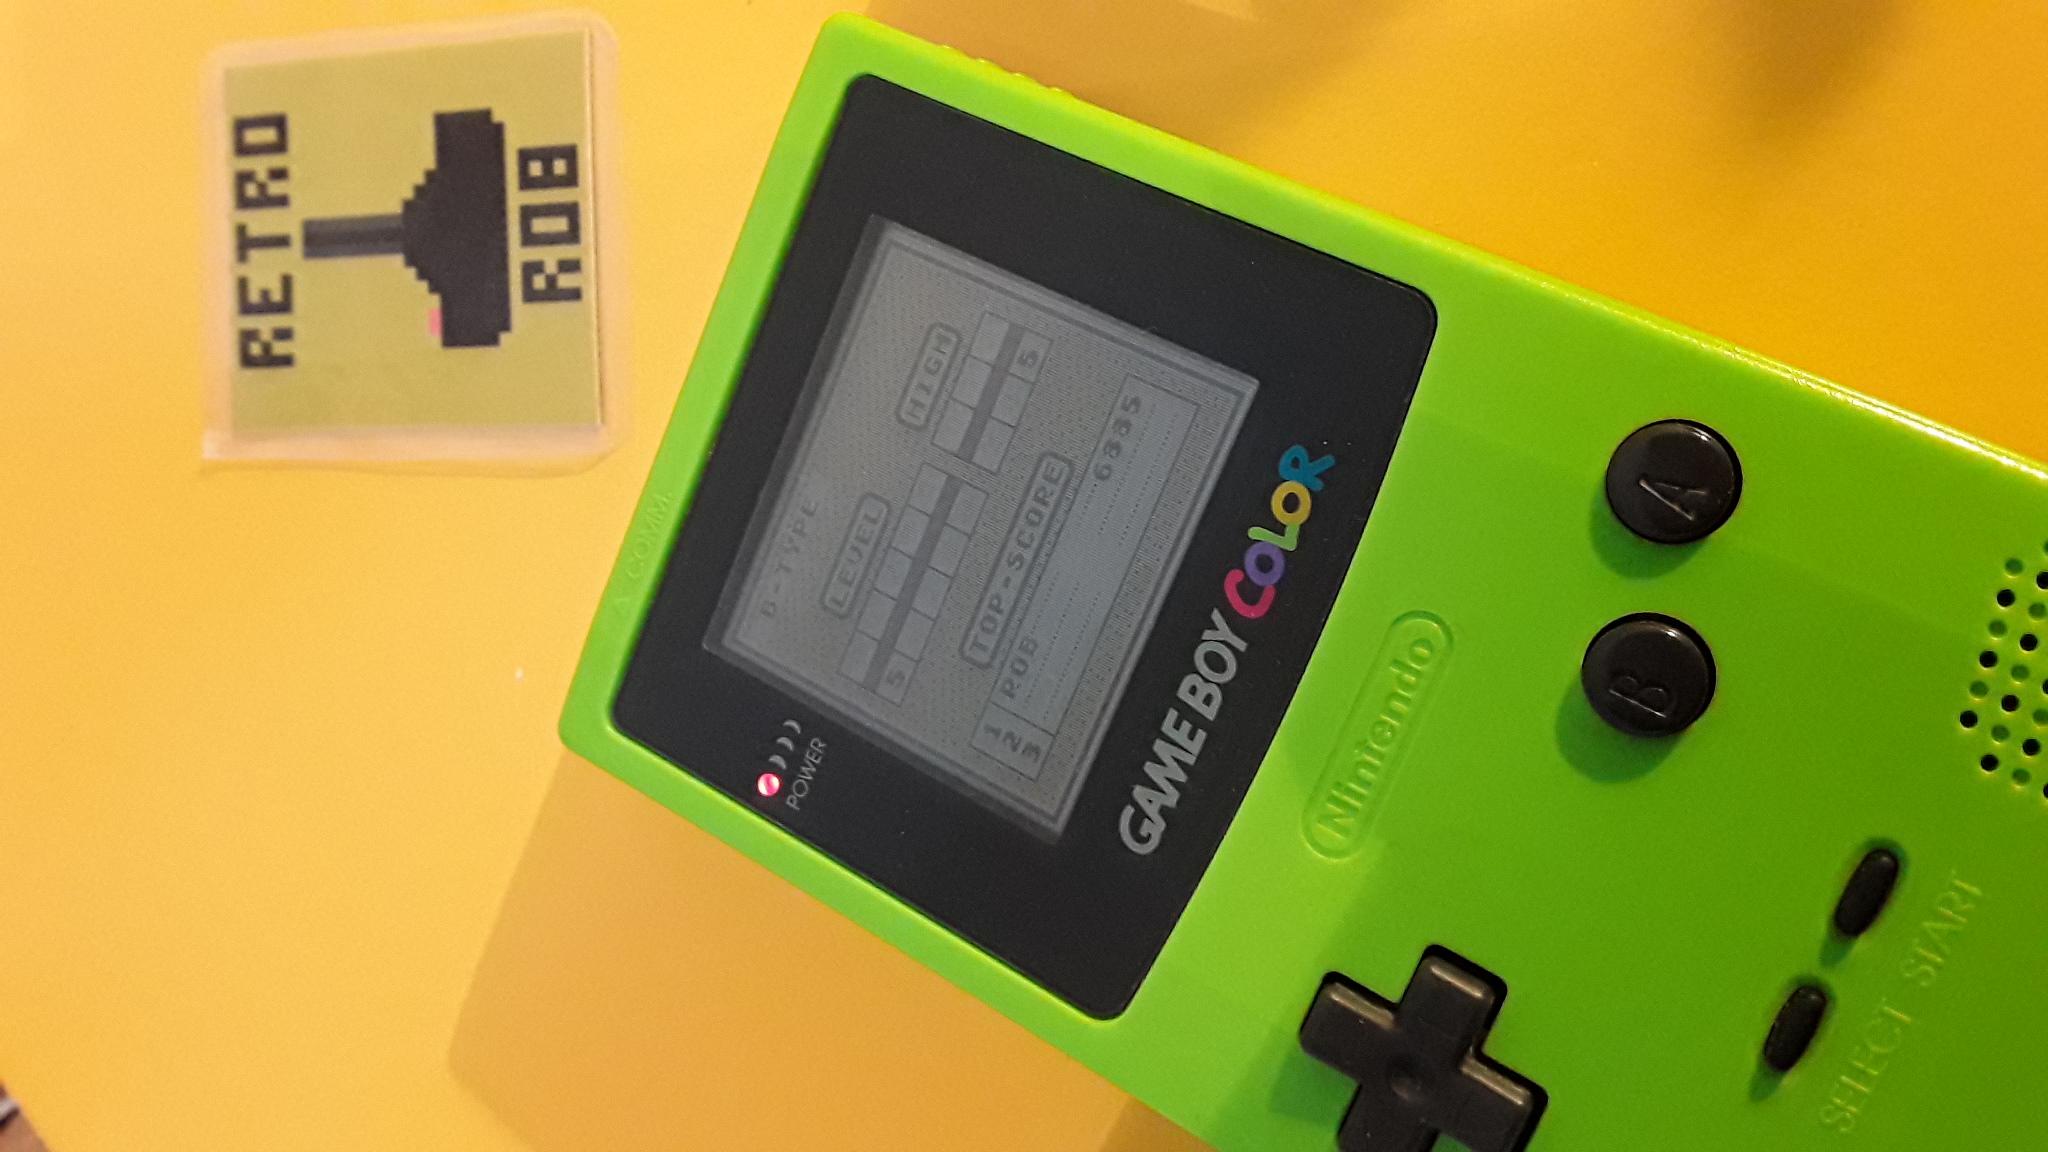 RetroRob: Tetris: Type B [Level 5 / High 5] (Game Boy) 6,885 points on 2020-10-03 10:40:31